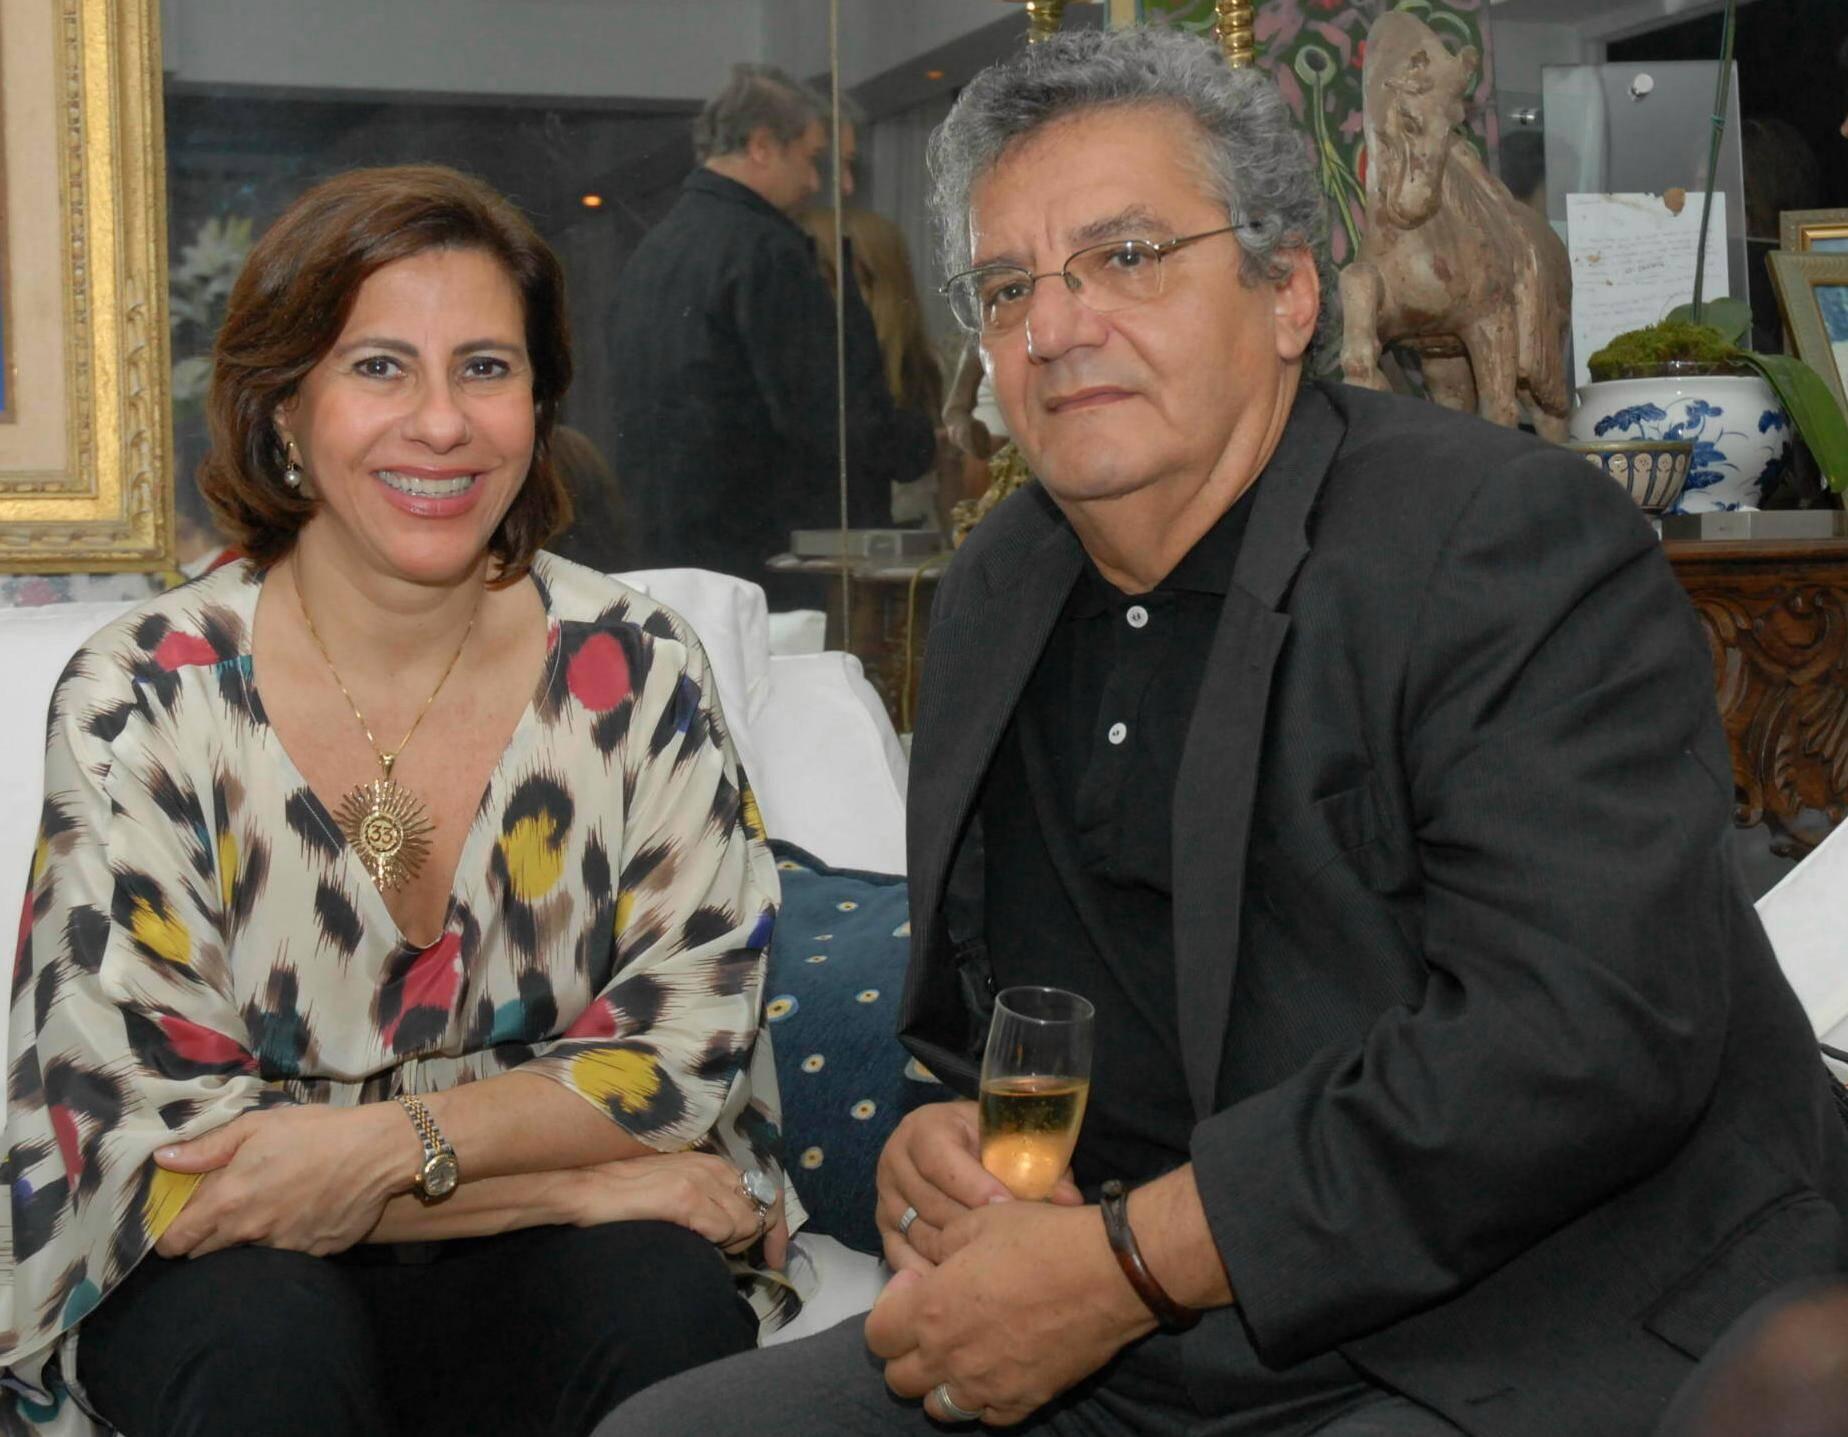 Alice Maria Tamborindeguy e Jorge Salomão, em 2011 /Foto: Arquivo site Lu Lacerda